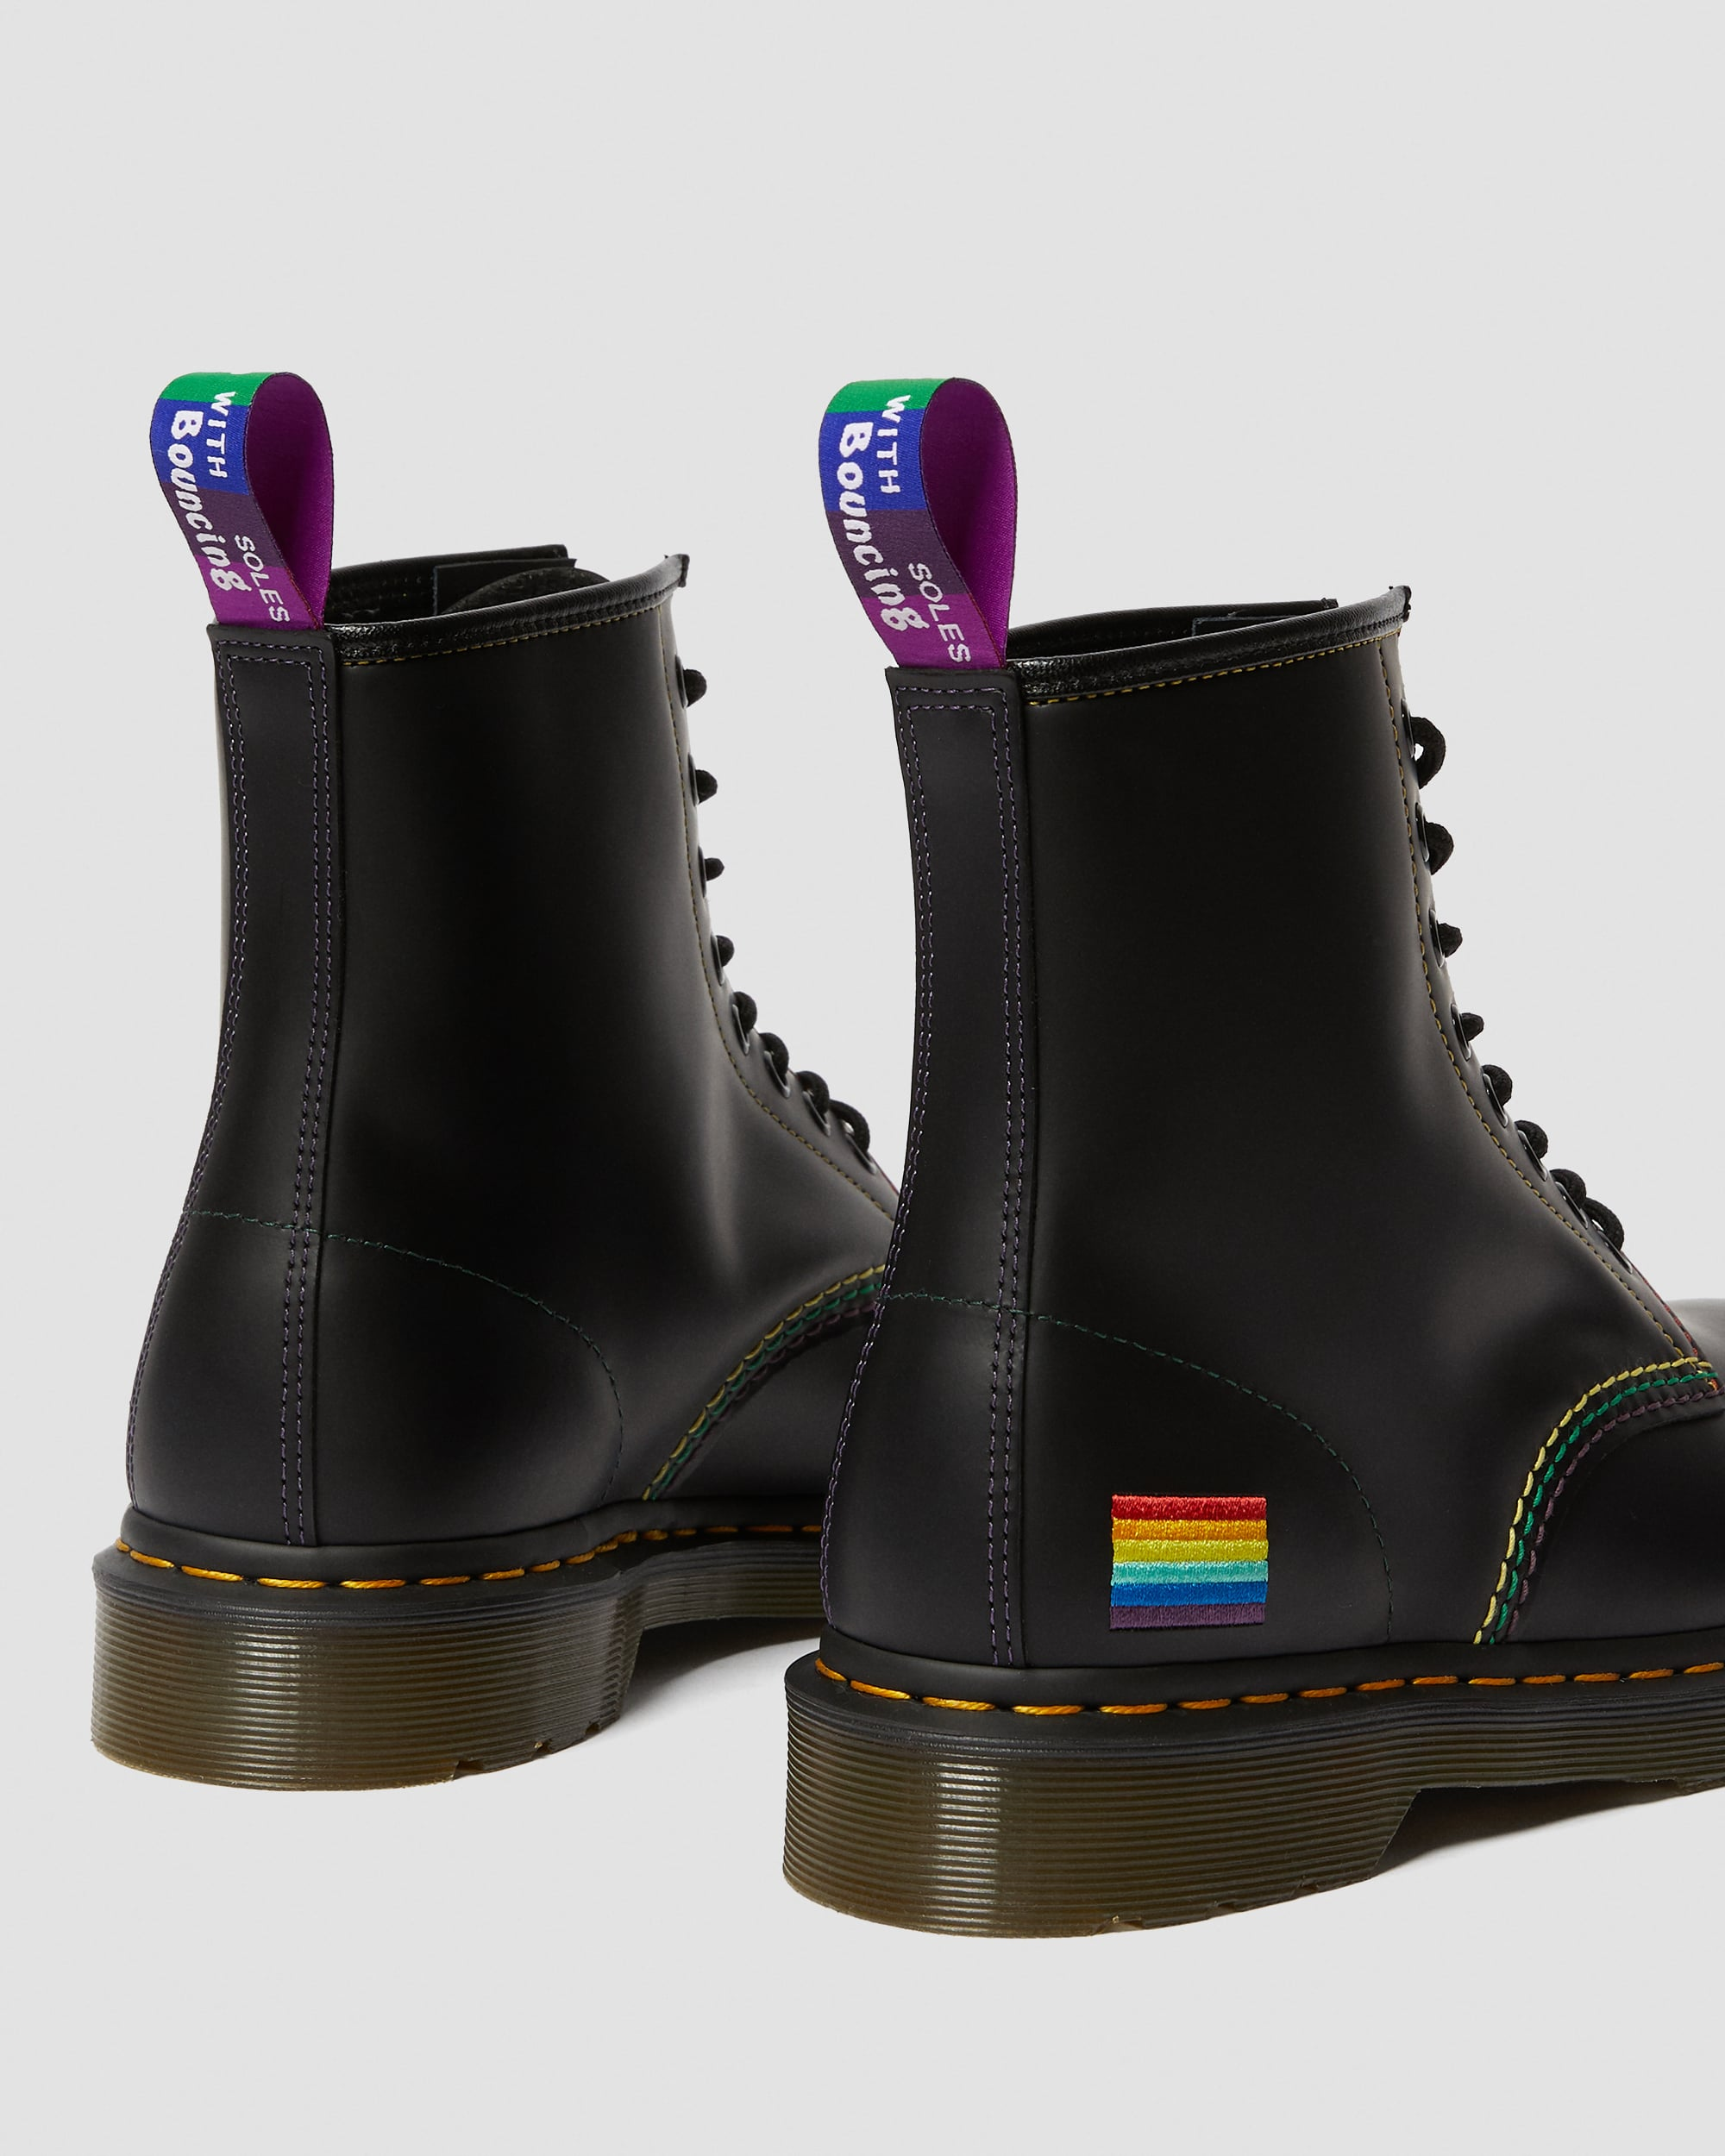 harry potter combat boots uk